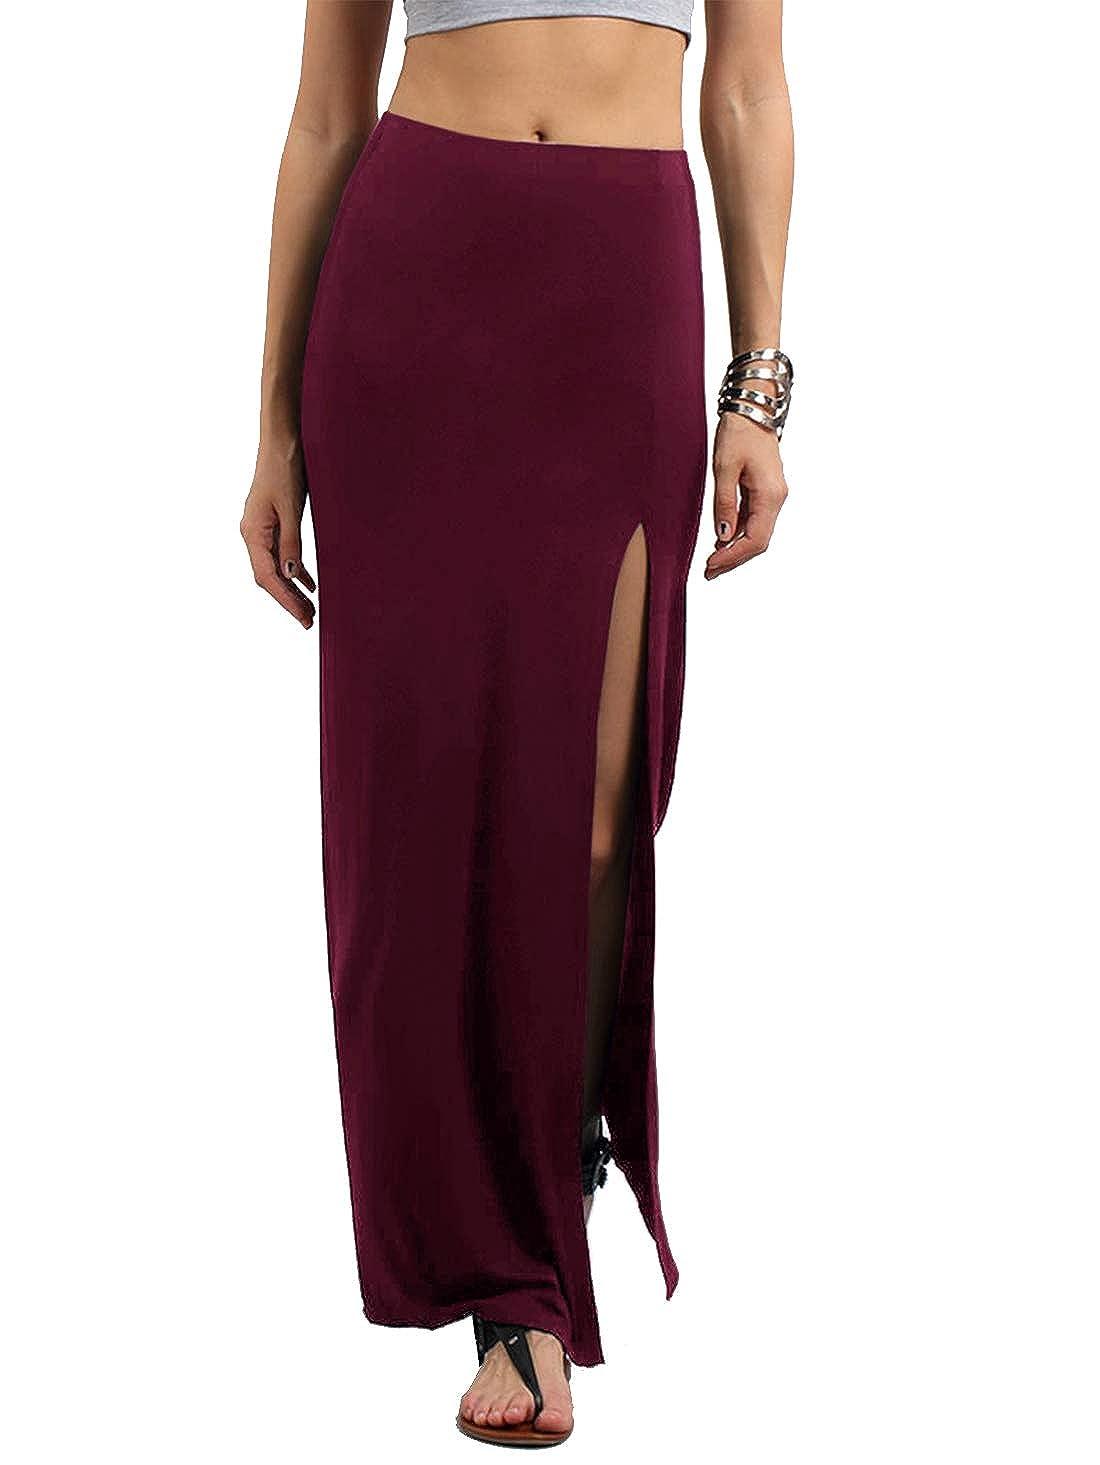 Burgundy Verdusa Women's Solid color High Waist Side Split Maxi Skirt